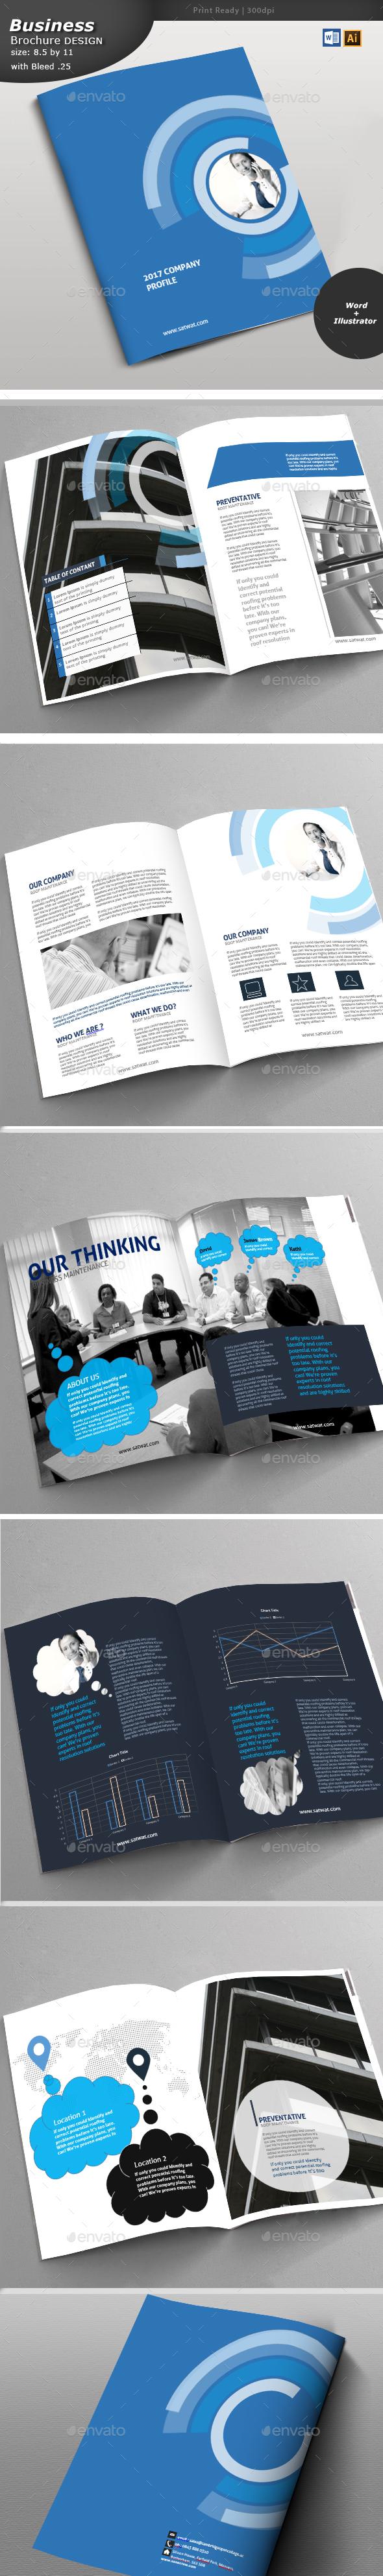 Company Profile Brochure - Print Templates